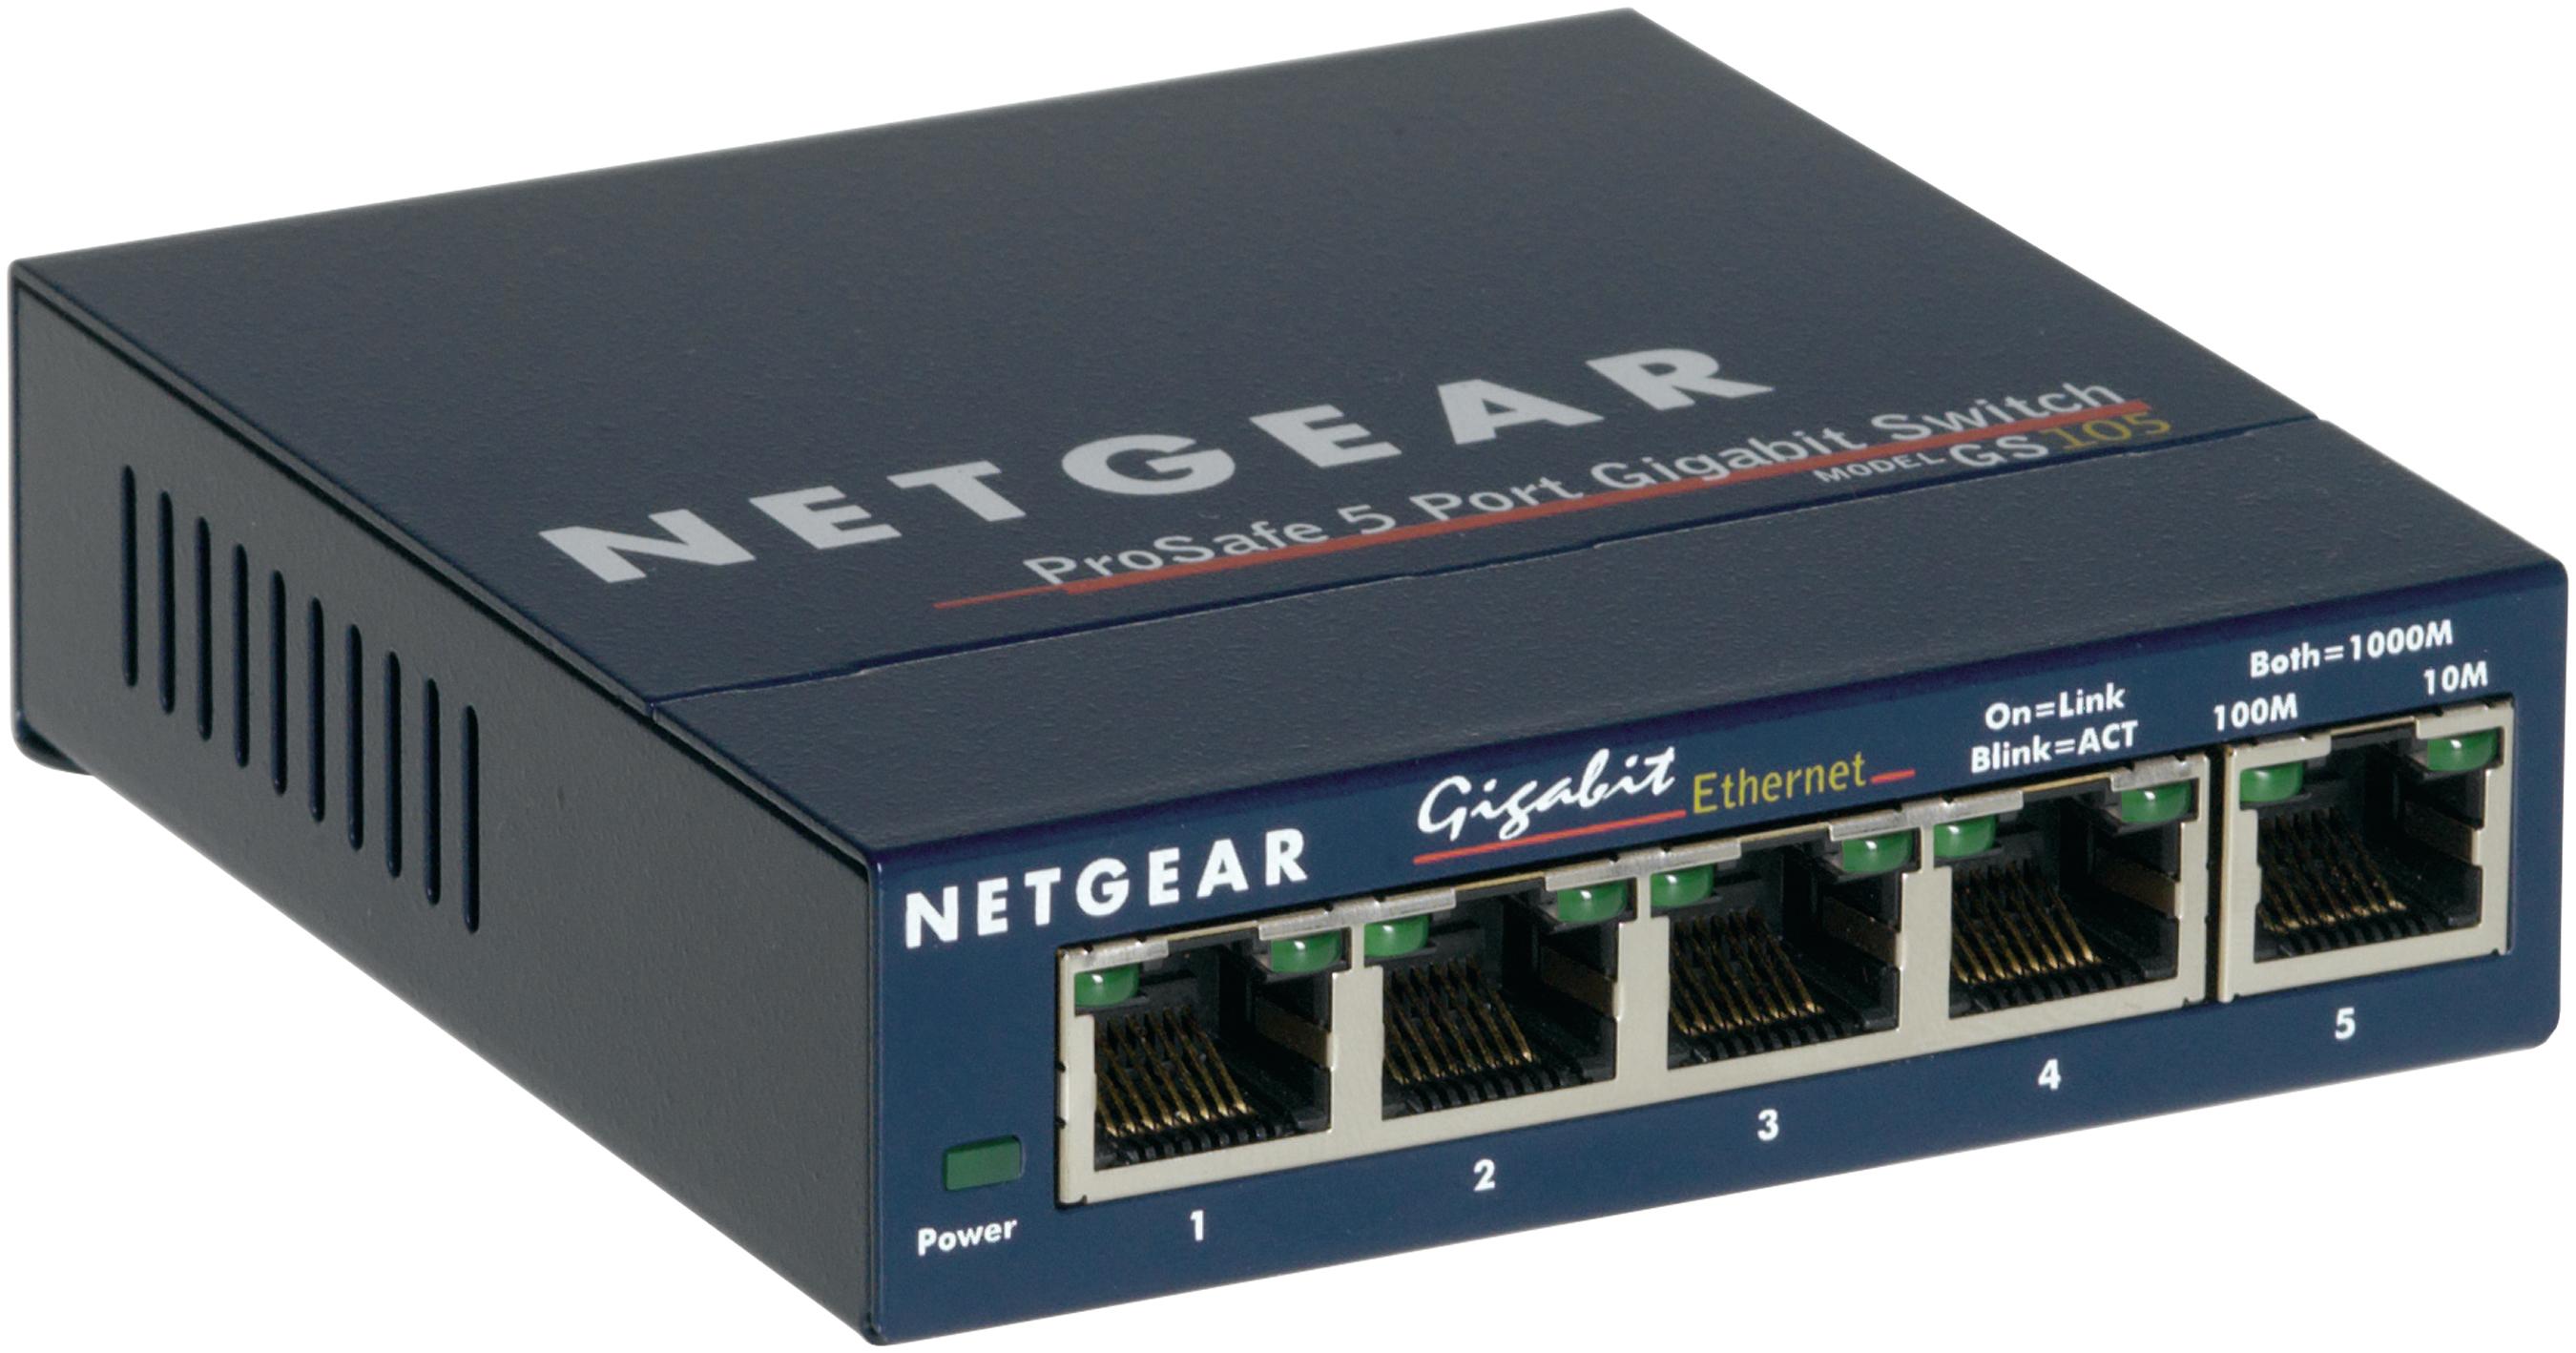 Netgear ProSafe GS105 - Switch - Kupferdraht 1 Gbps - 5-Port 3 HE - Extern